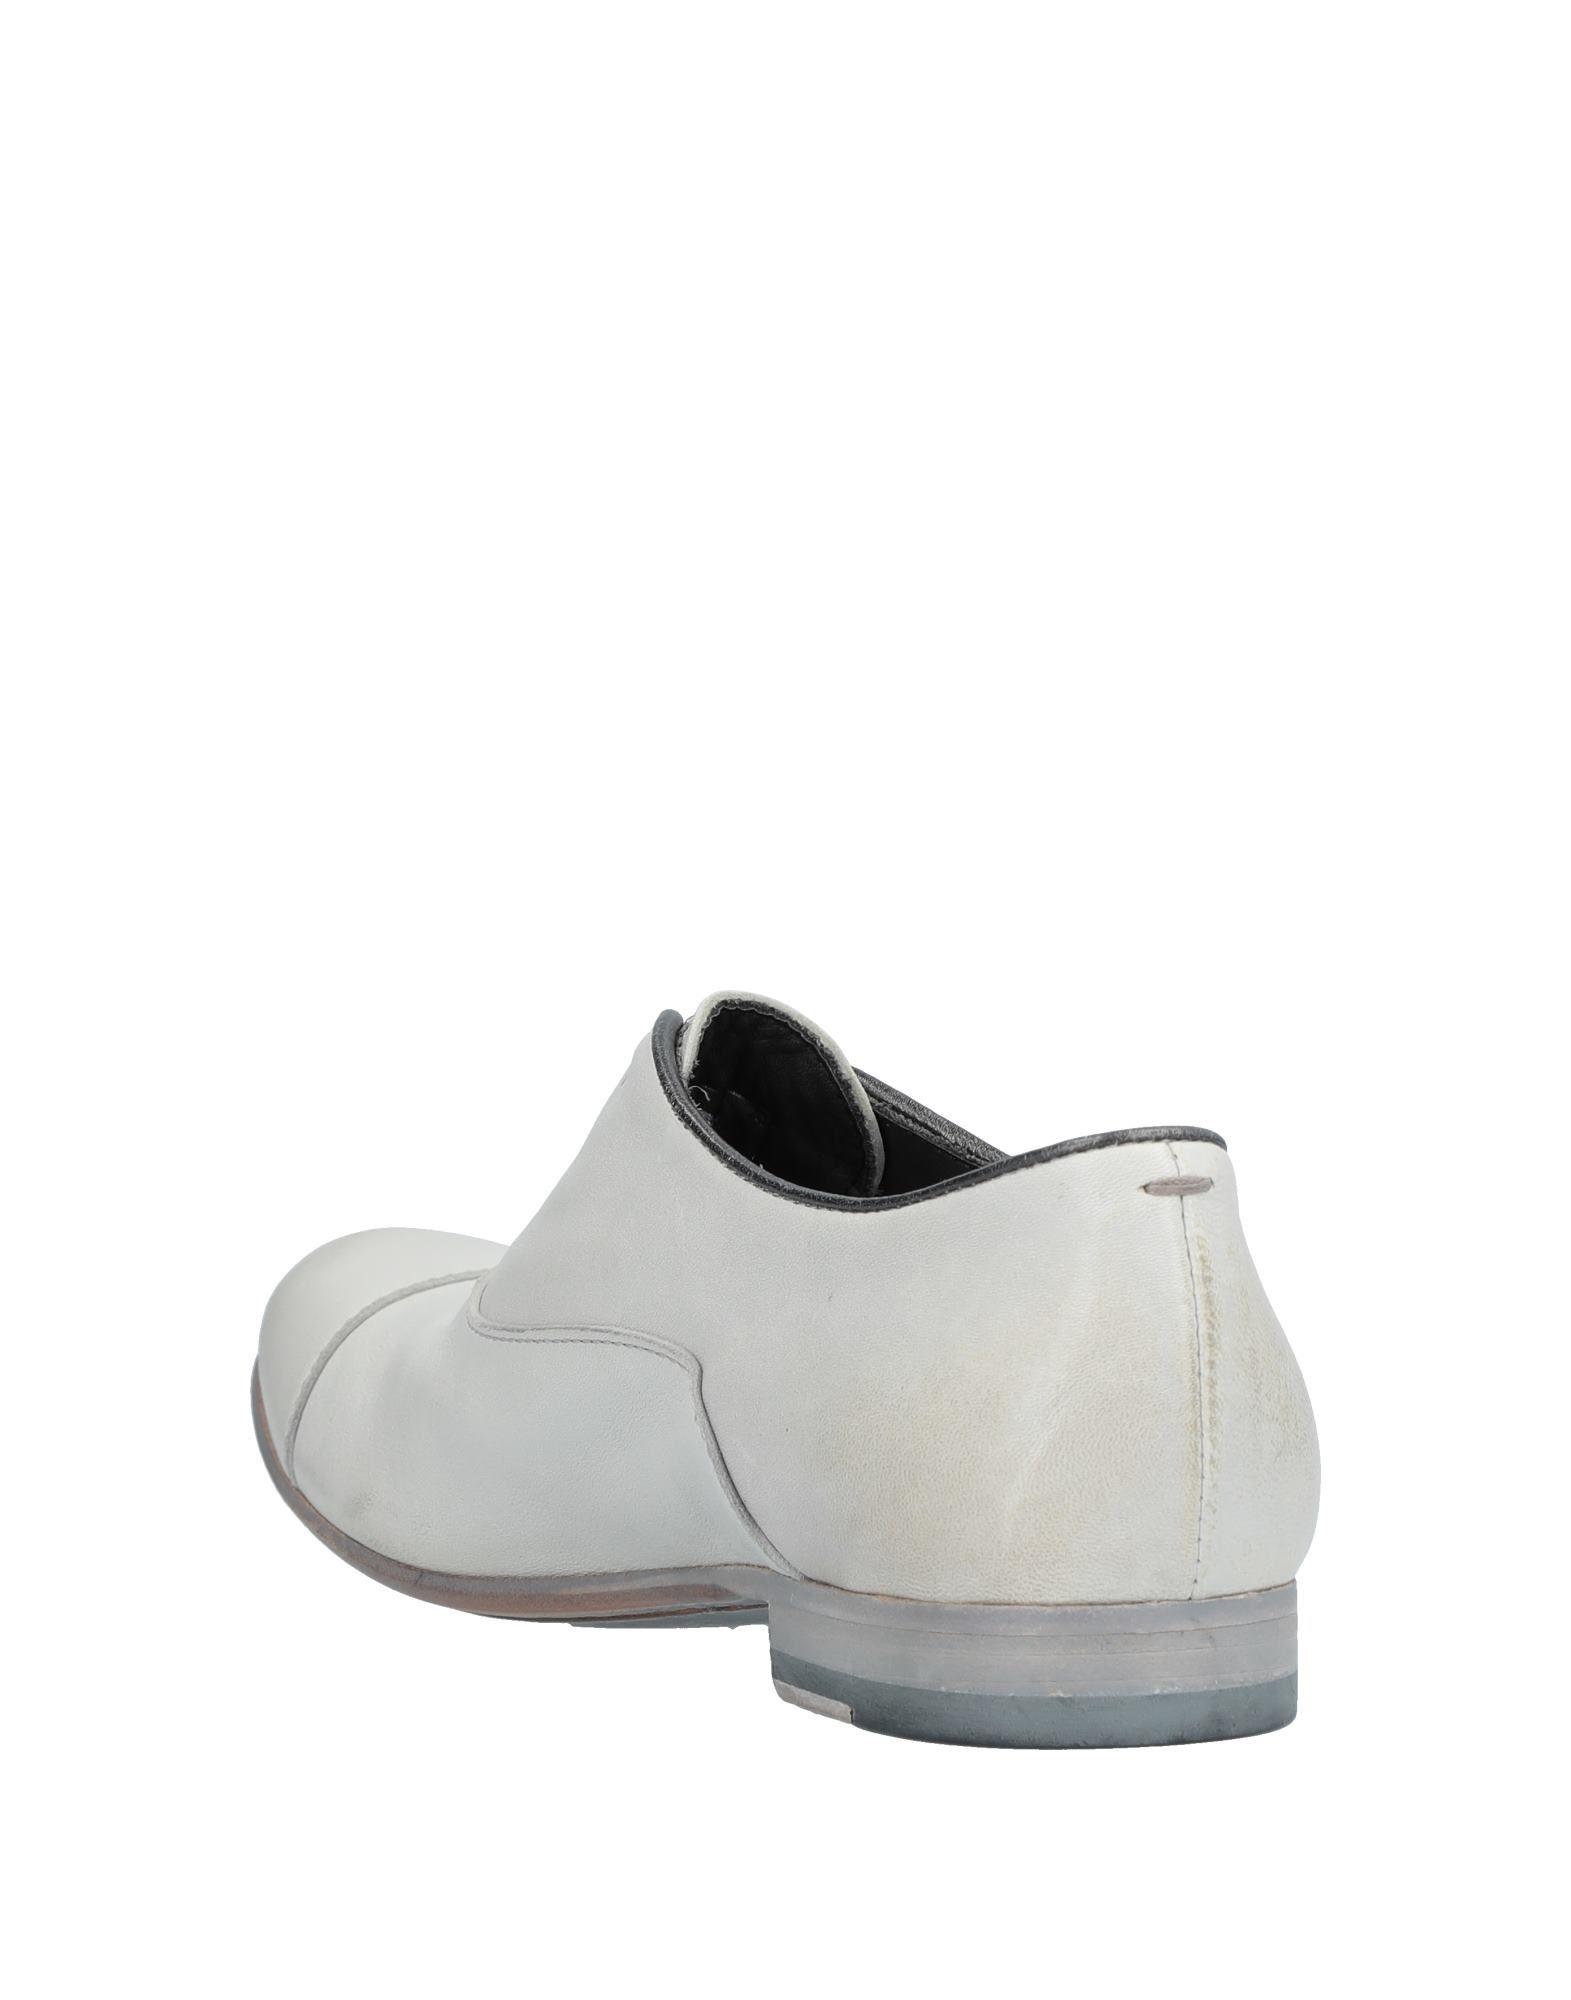 Stilvolle billige Schuhe Mokassins Pantanetti Mokassins Schuhe Damen 11532859NI 14f0af